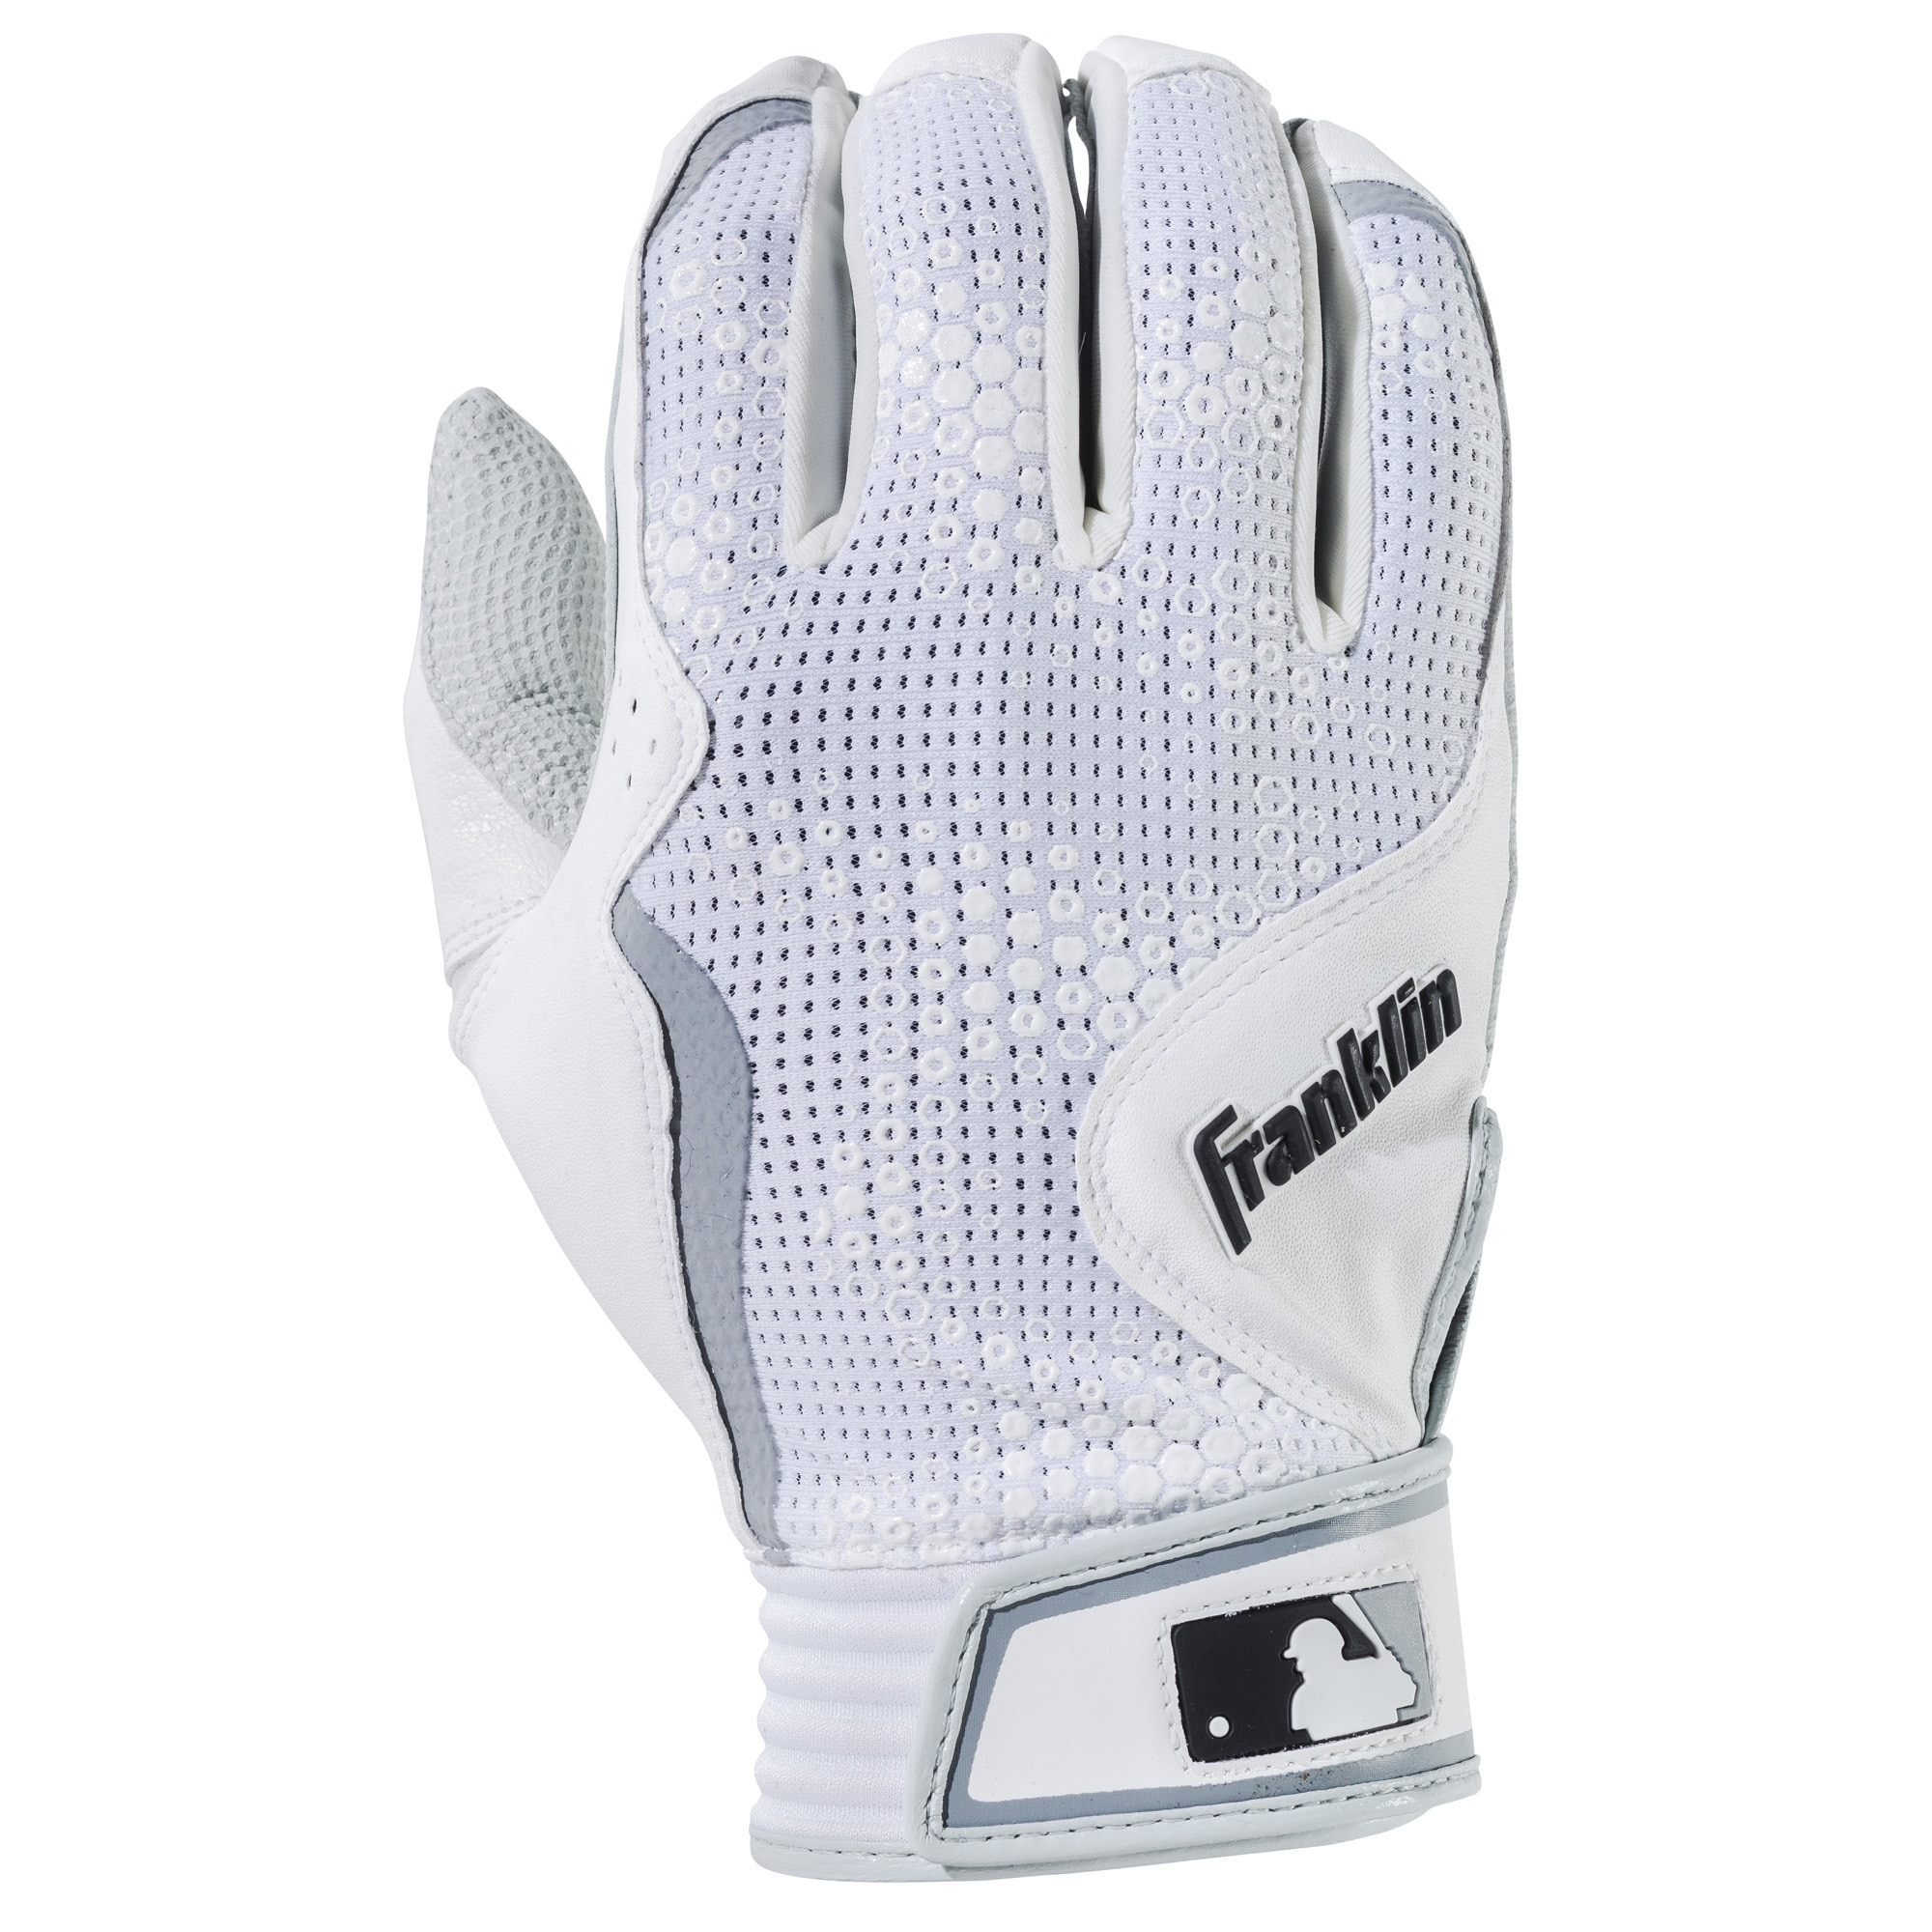 Franklin Sports Youth Freeflex Series Batting Gloves, Assorted by Franklin Sports